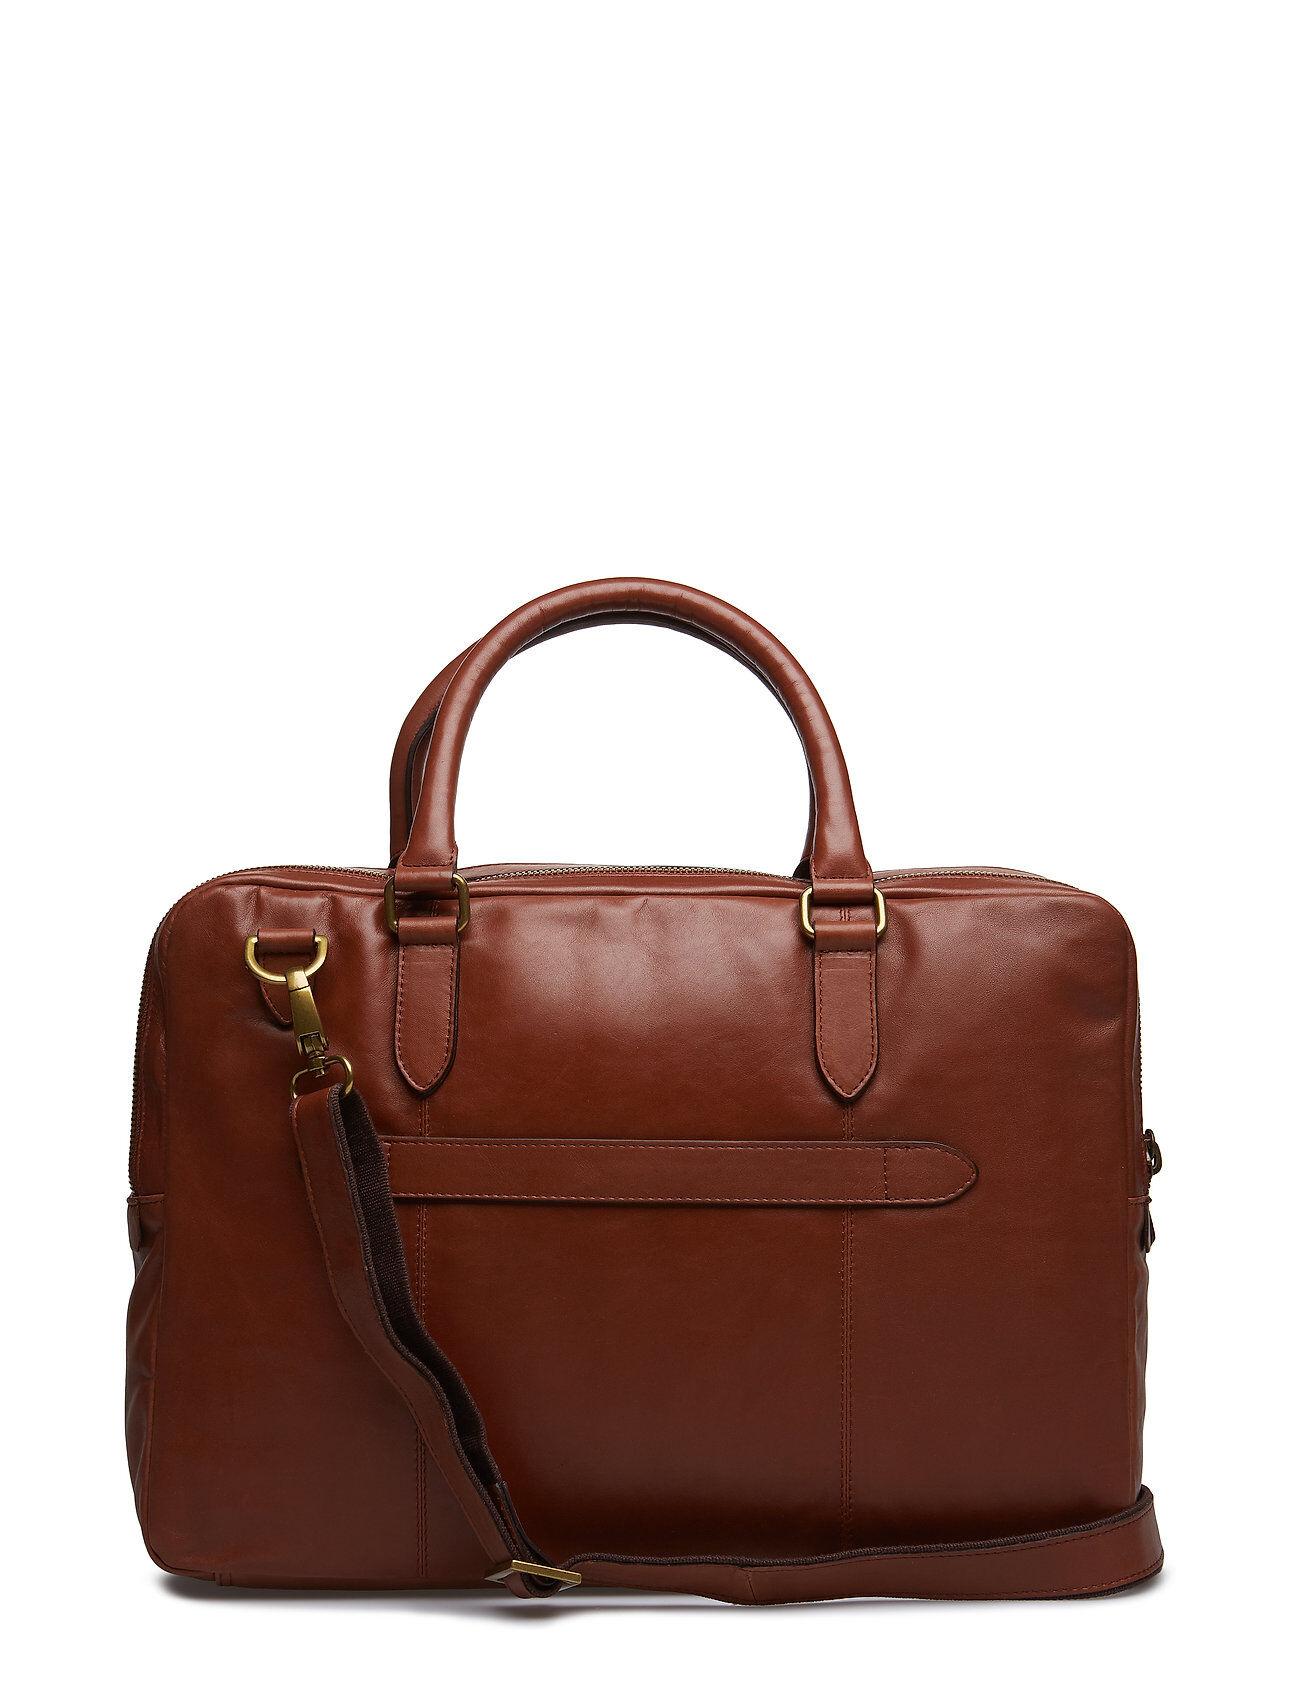 Royal RepubliQ Capital Laptop Bag Double